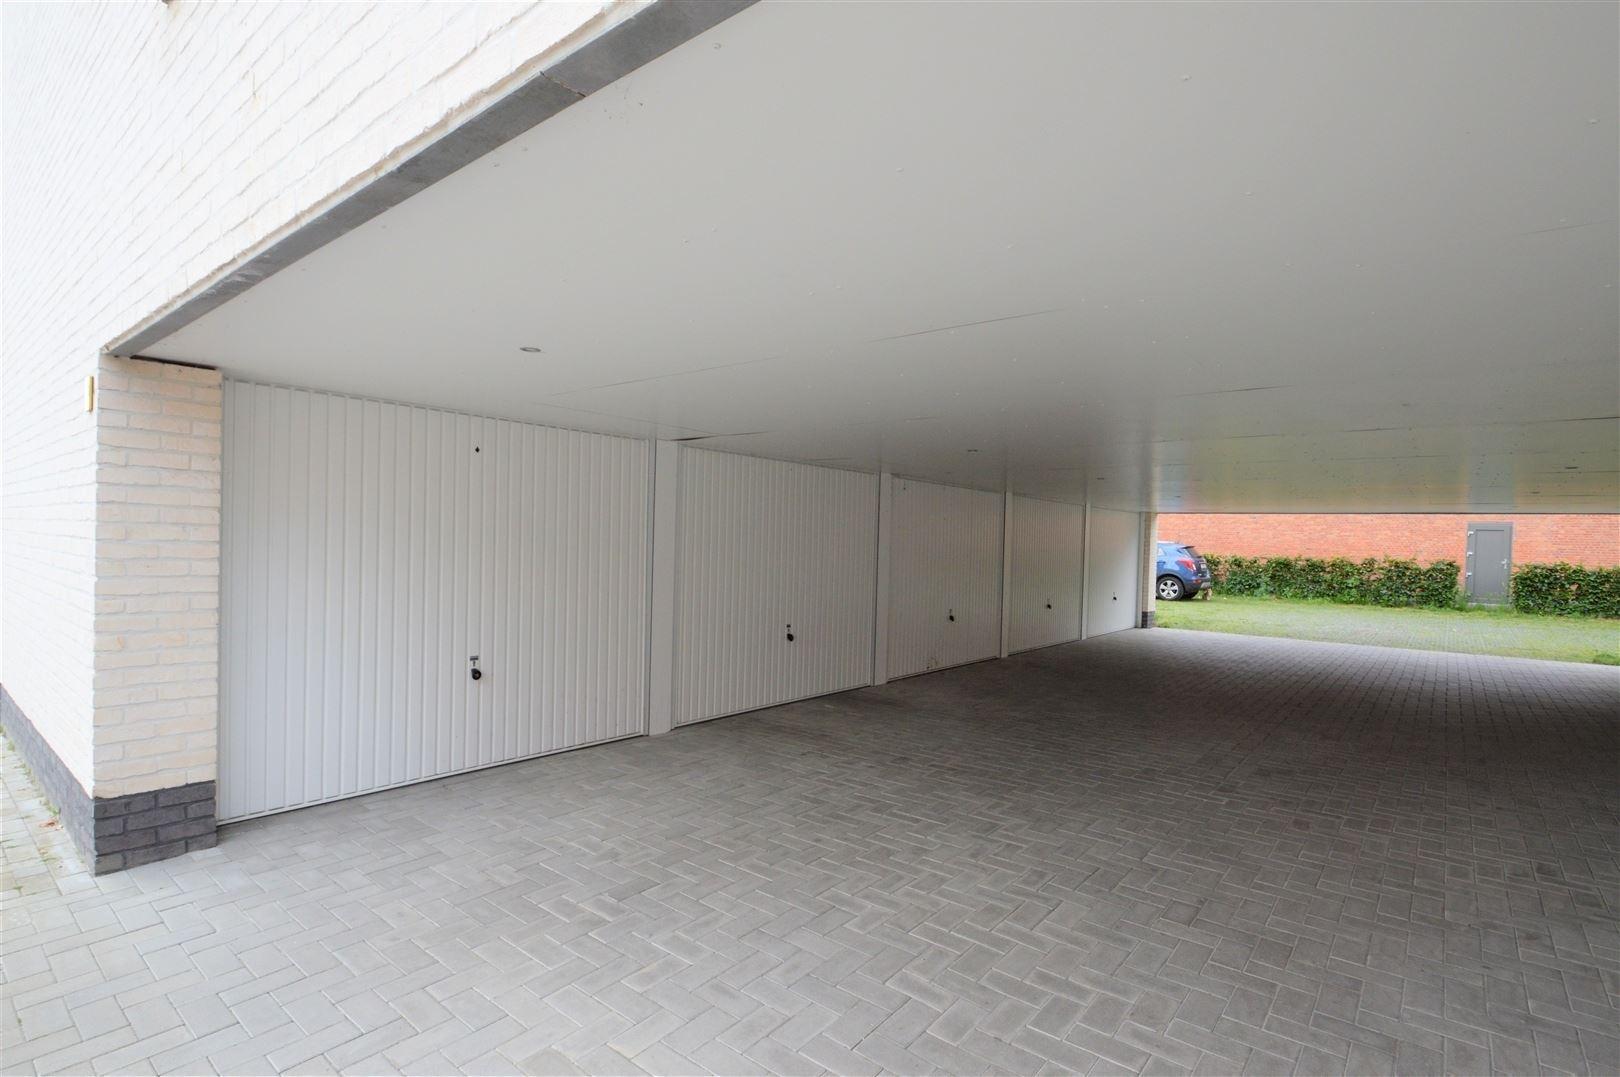 Foto 10 : Appartement te 9220 HAMME (België) - Prijs € 720